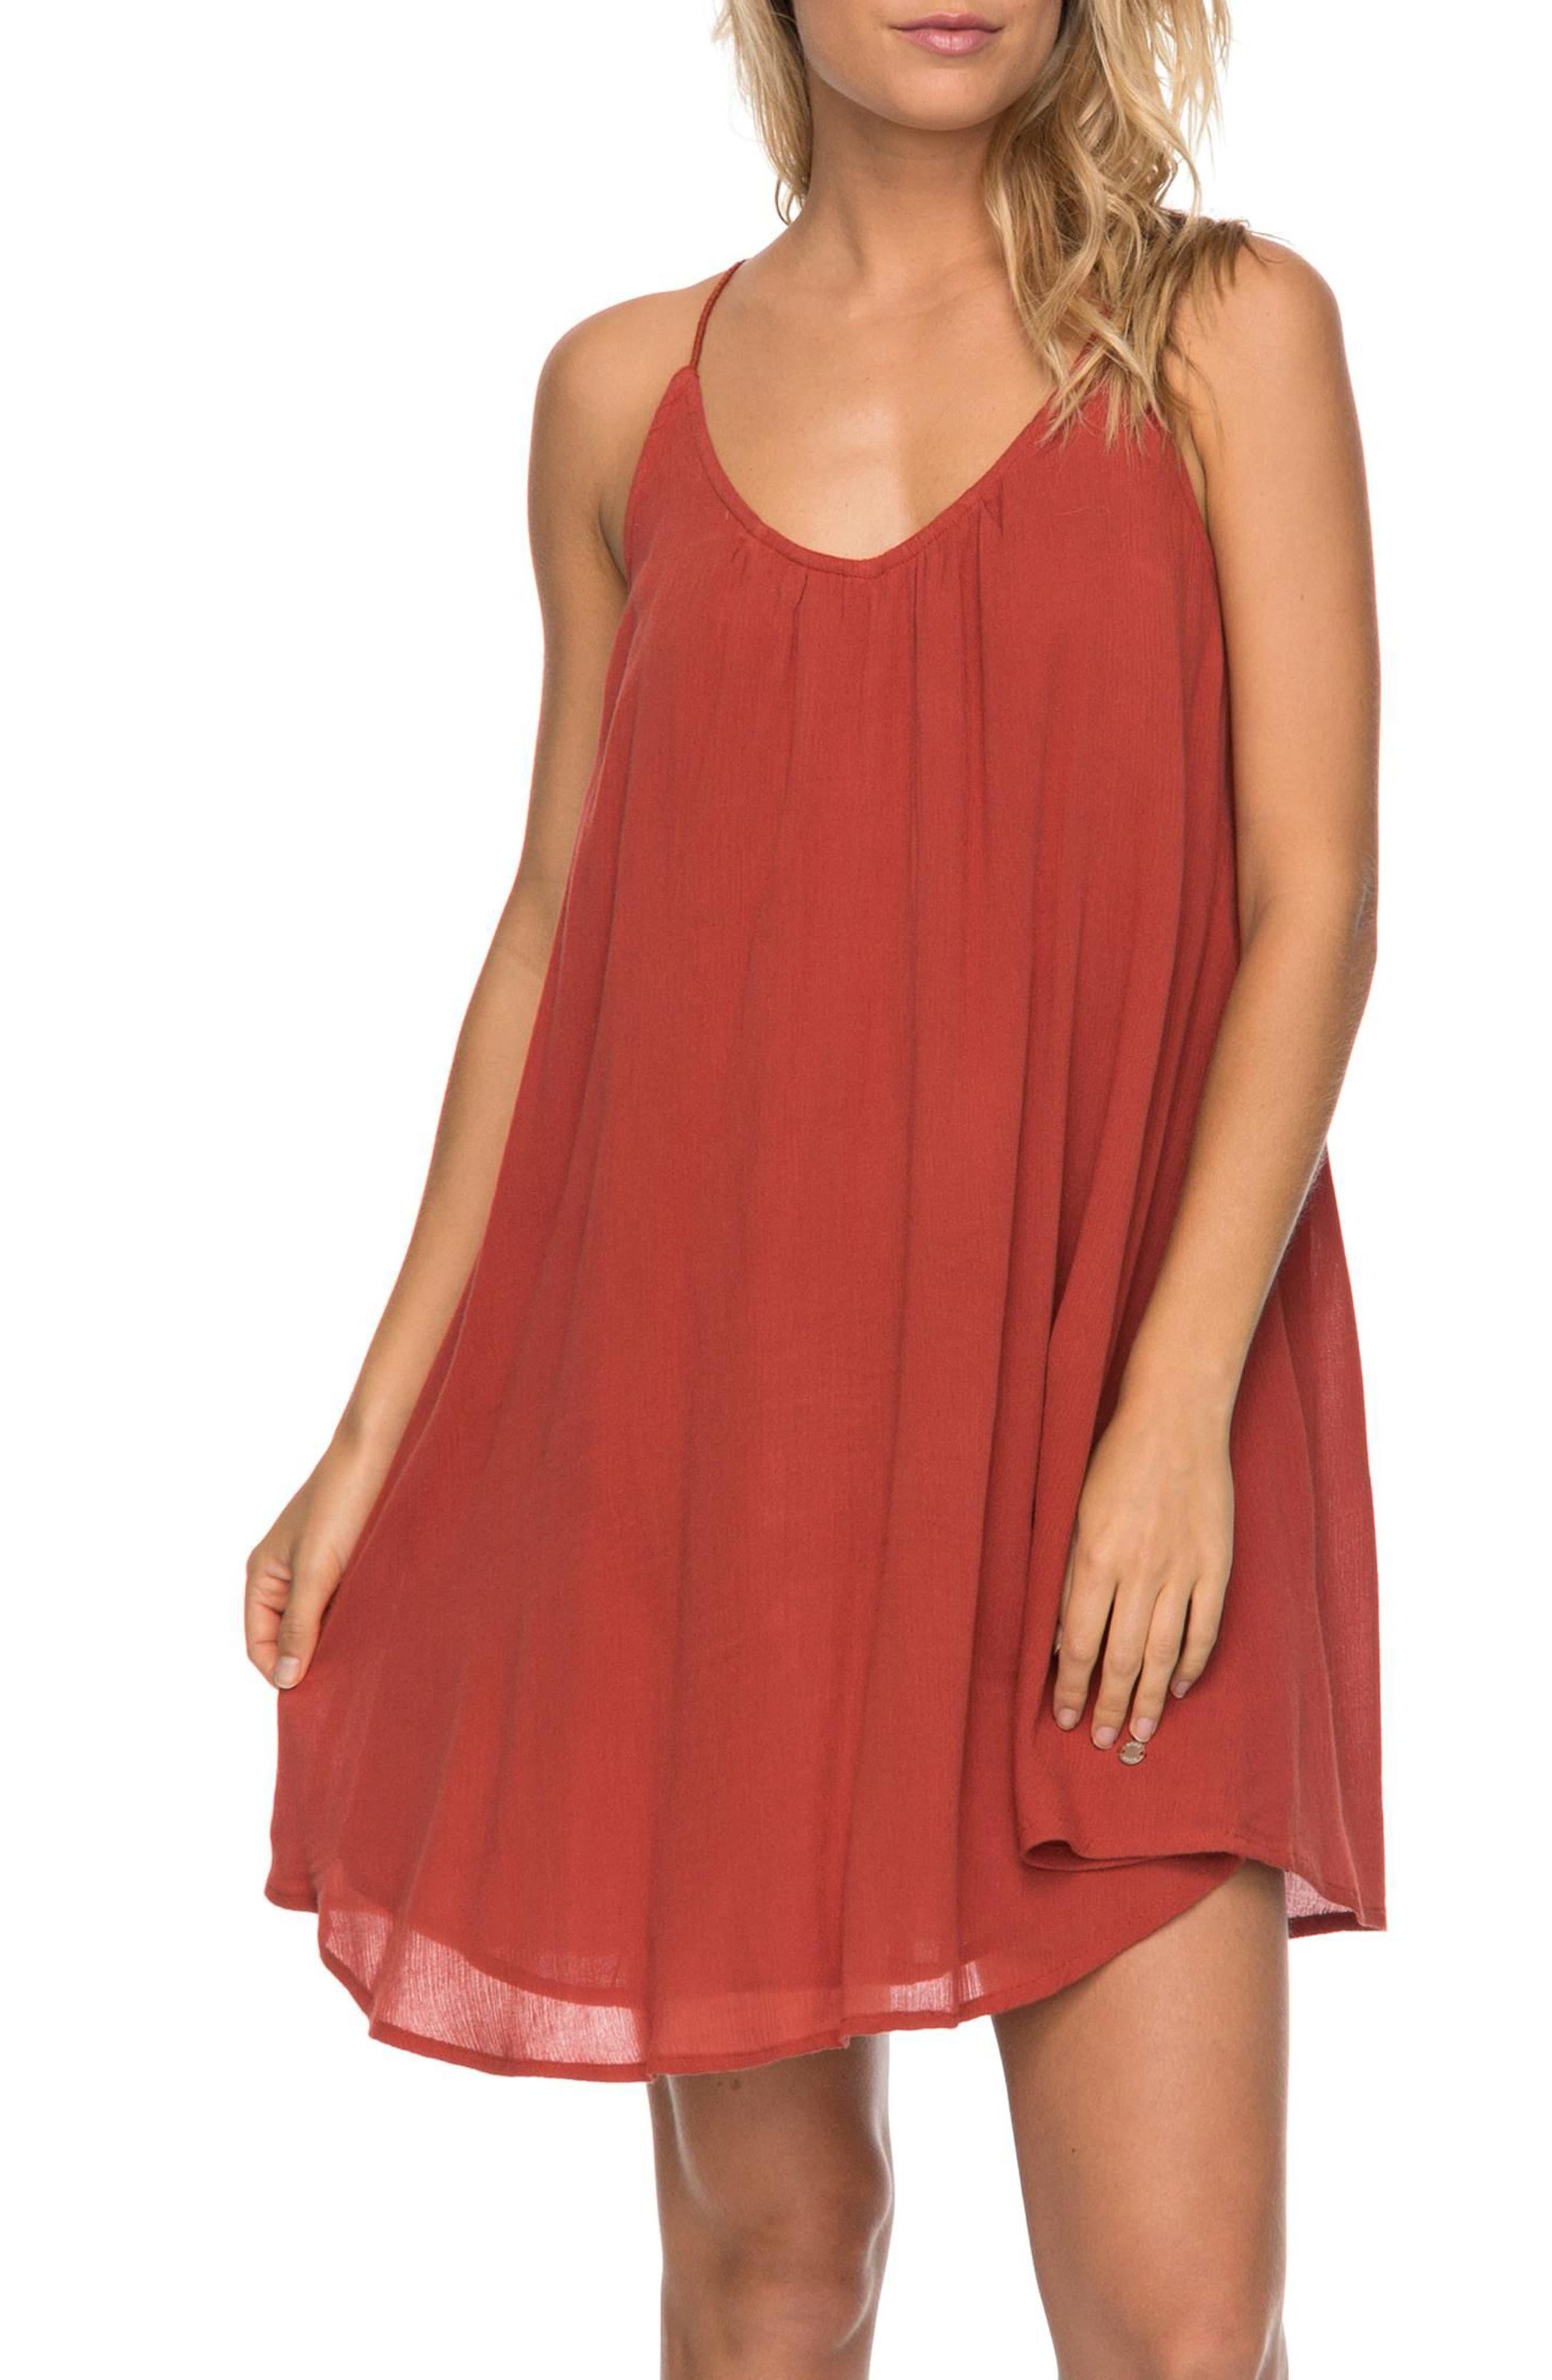 Great Intentions Trapeze Dress,                             Main thumbnail 1, color,                             Tandoori Spice